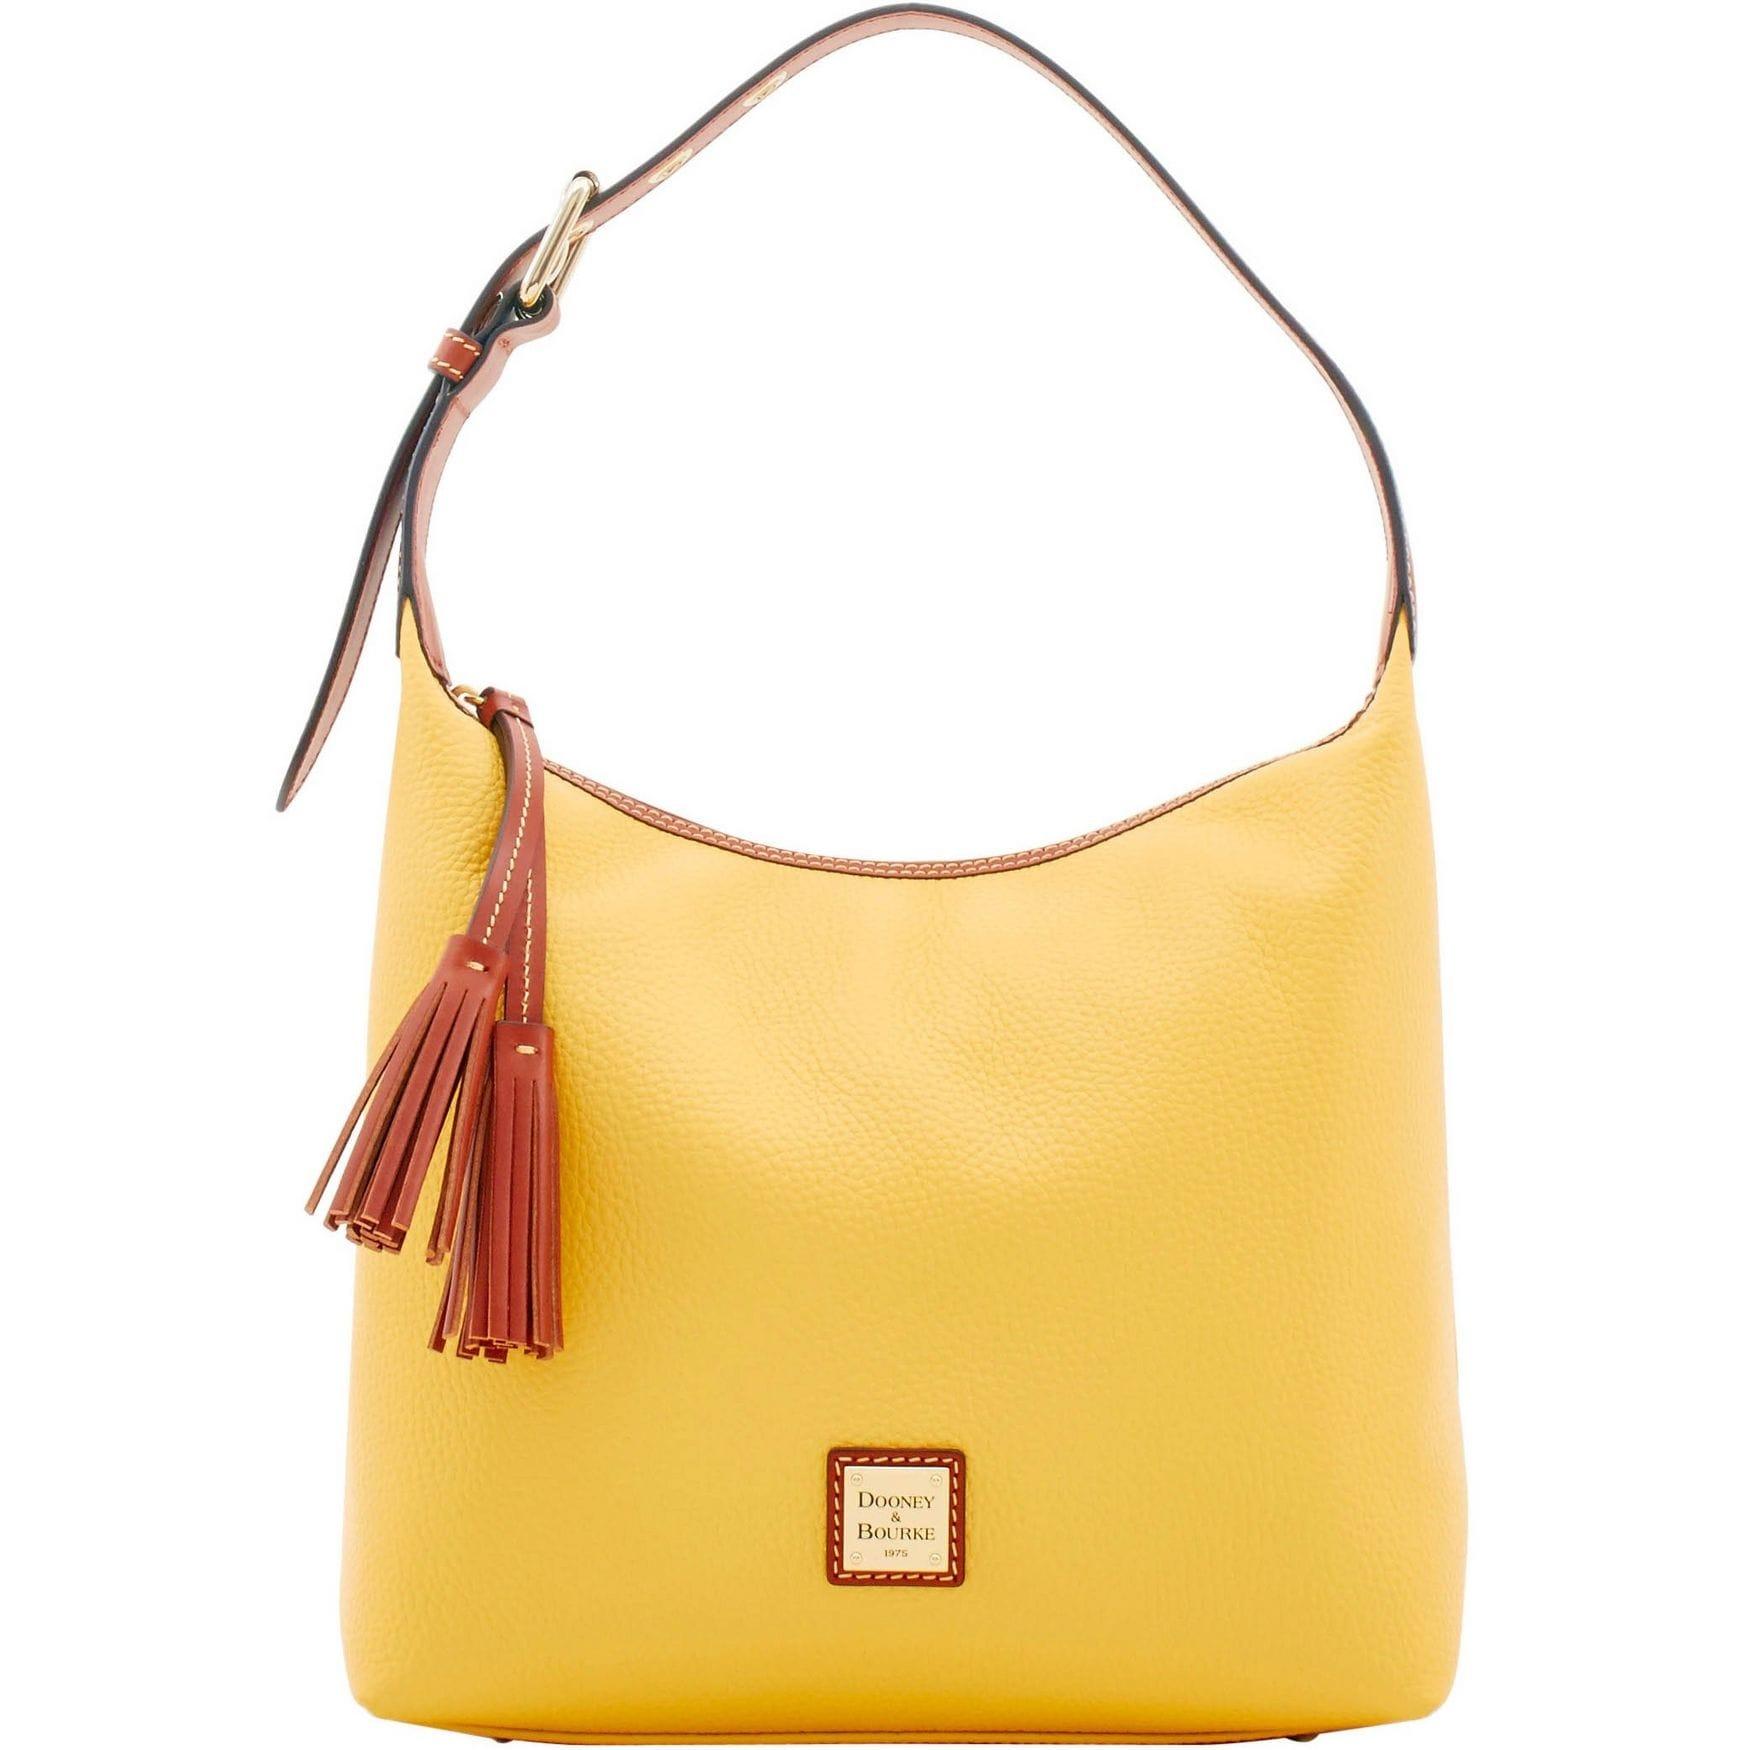 6c2239ac7 Dooney & Bourke Pebble Grain Paige Sac Shoulder Bag (Introduced by Dooney &  Bourke in )